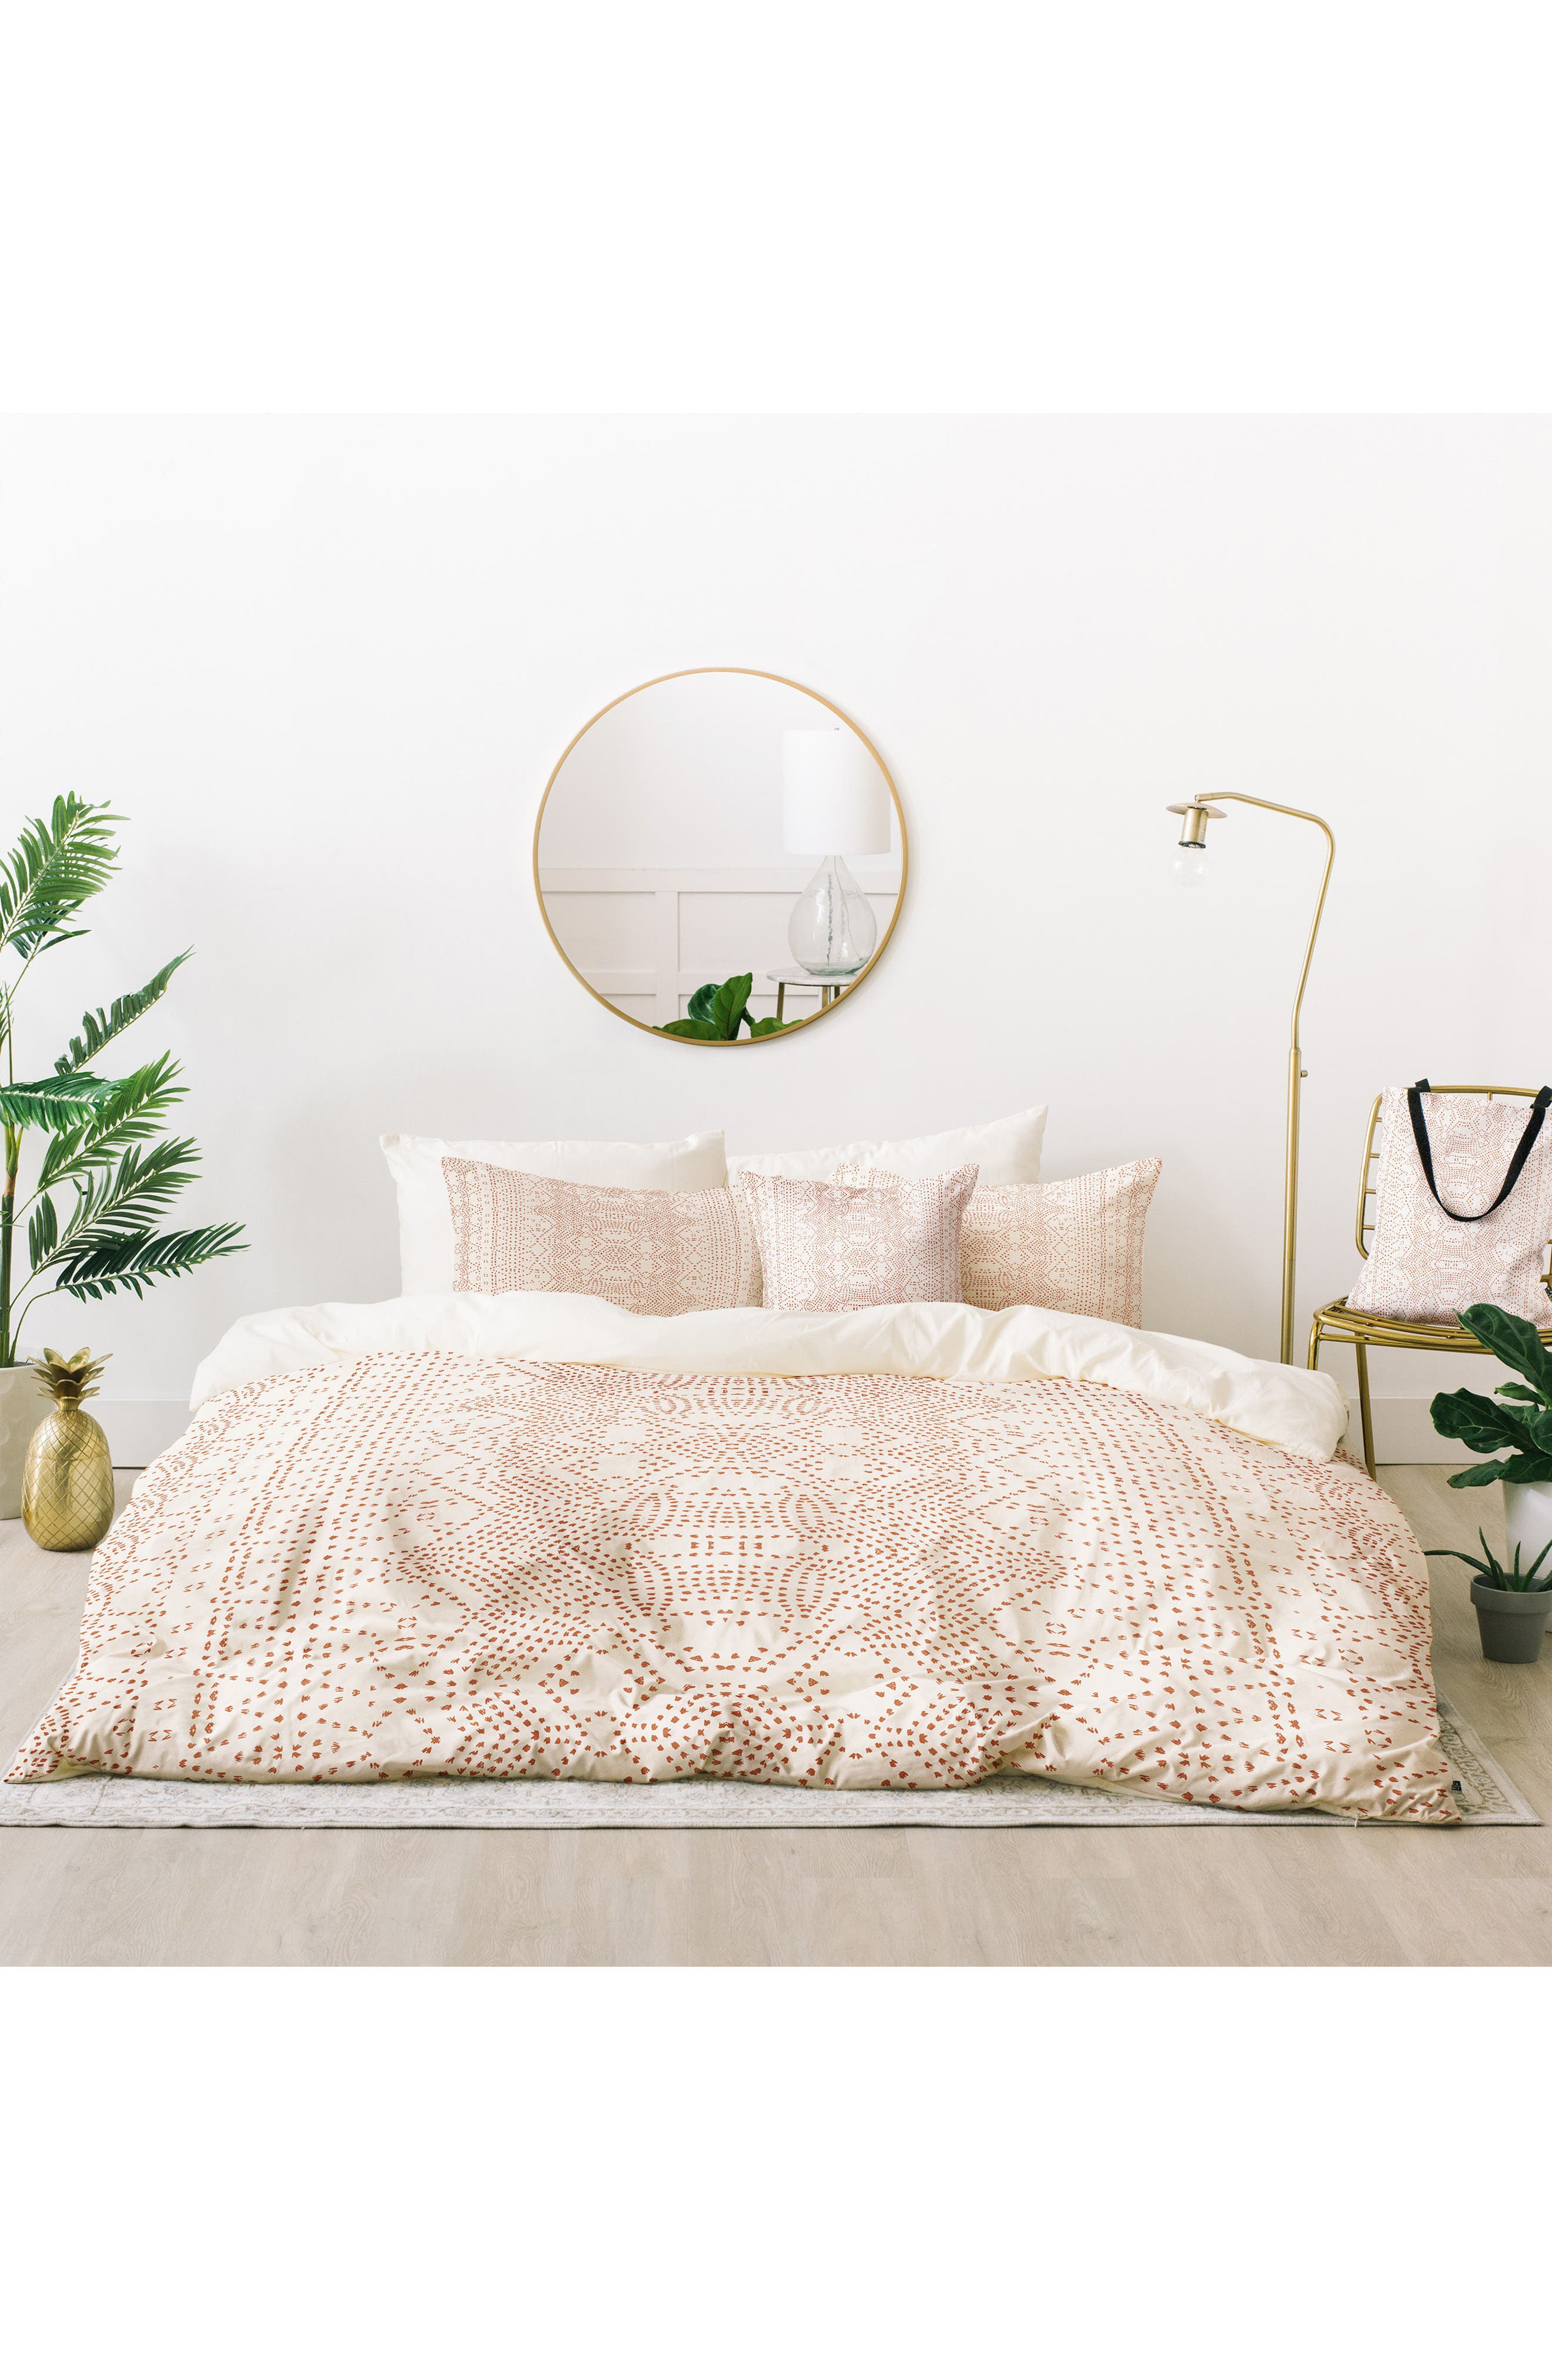 Deny Designs Holli Zollinger Marrakeshi Bed in a Bag Duvet Cover, Sham & Accent Pillow Set